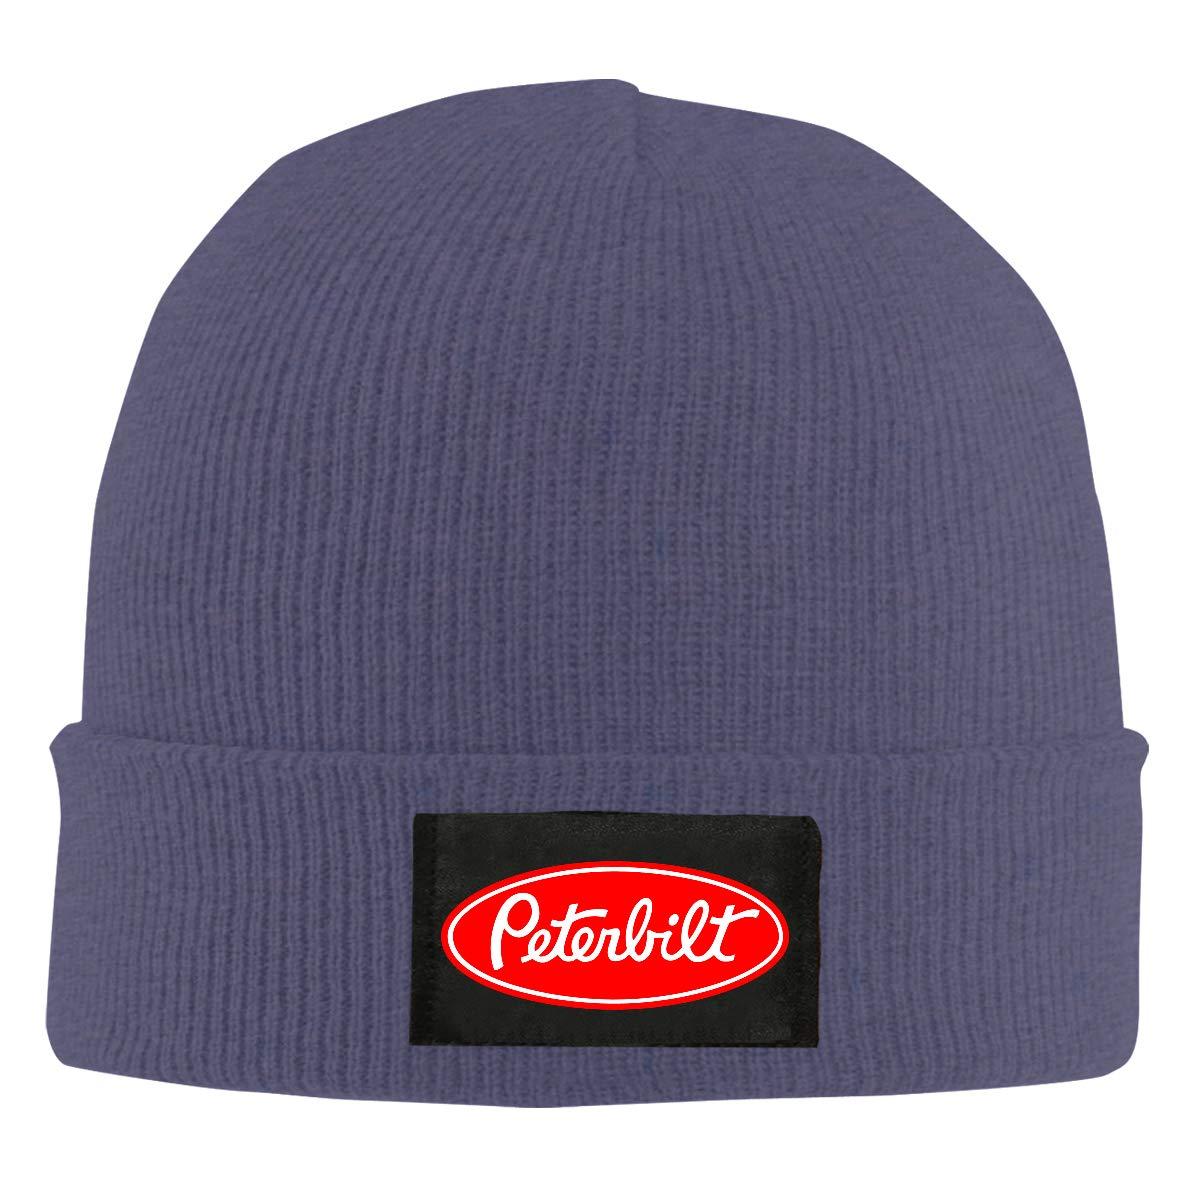 Customart winter soft beanie caps for men women peterbilt at amazon mens  clothing store jpg 1200x1200 55860fc3e539